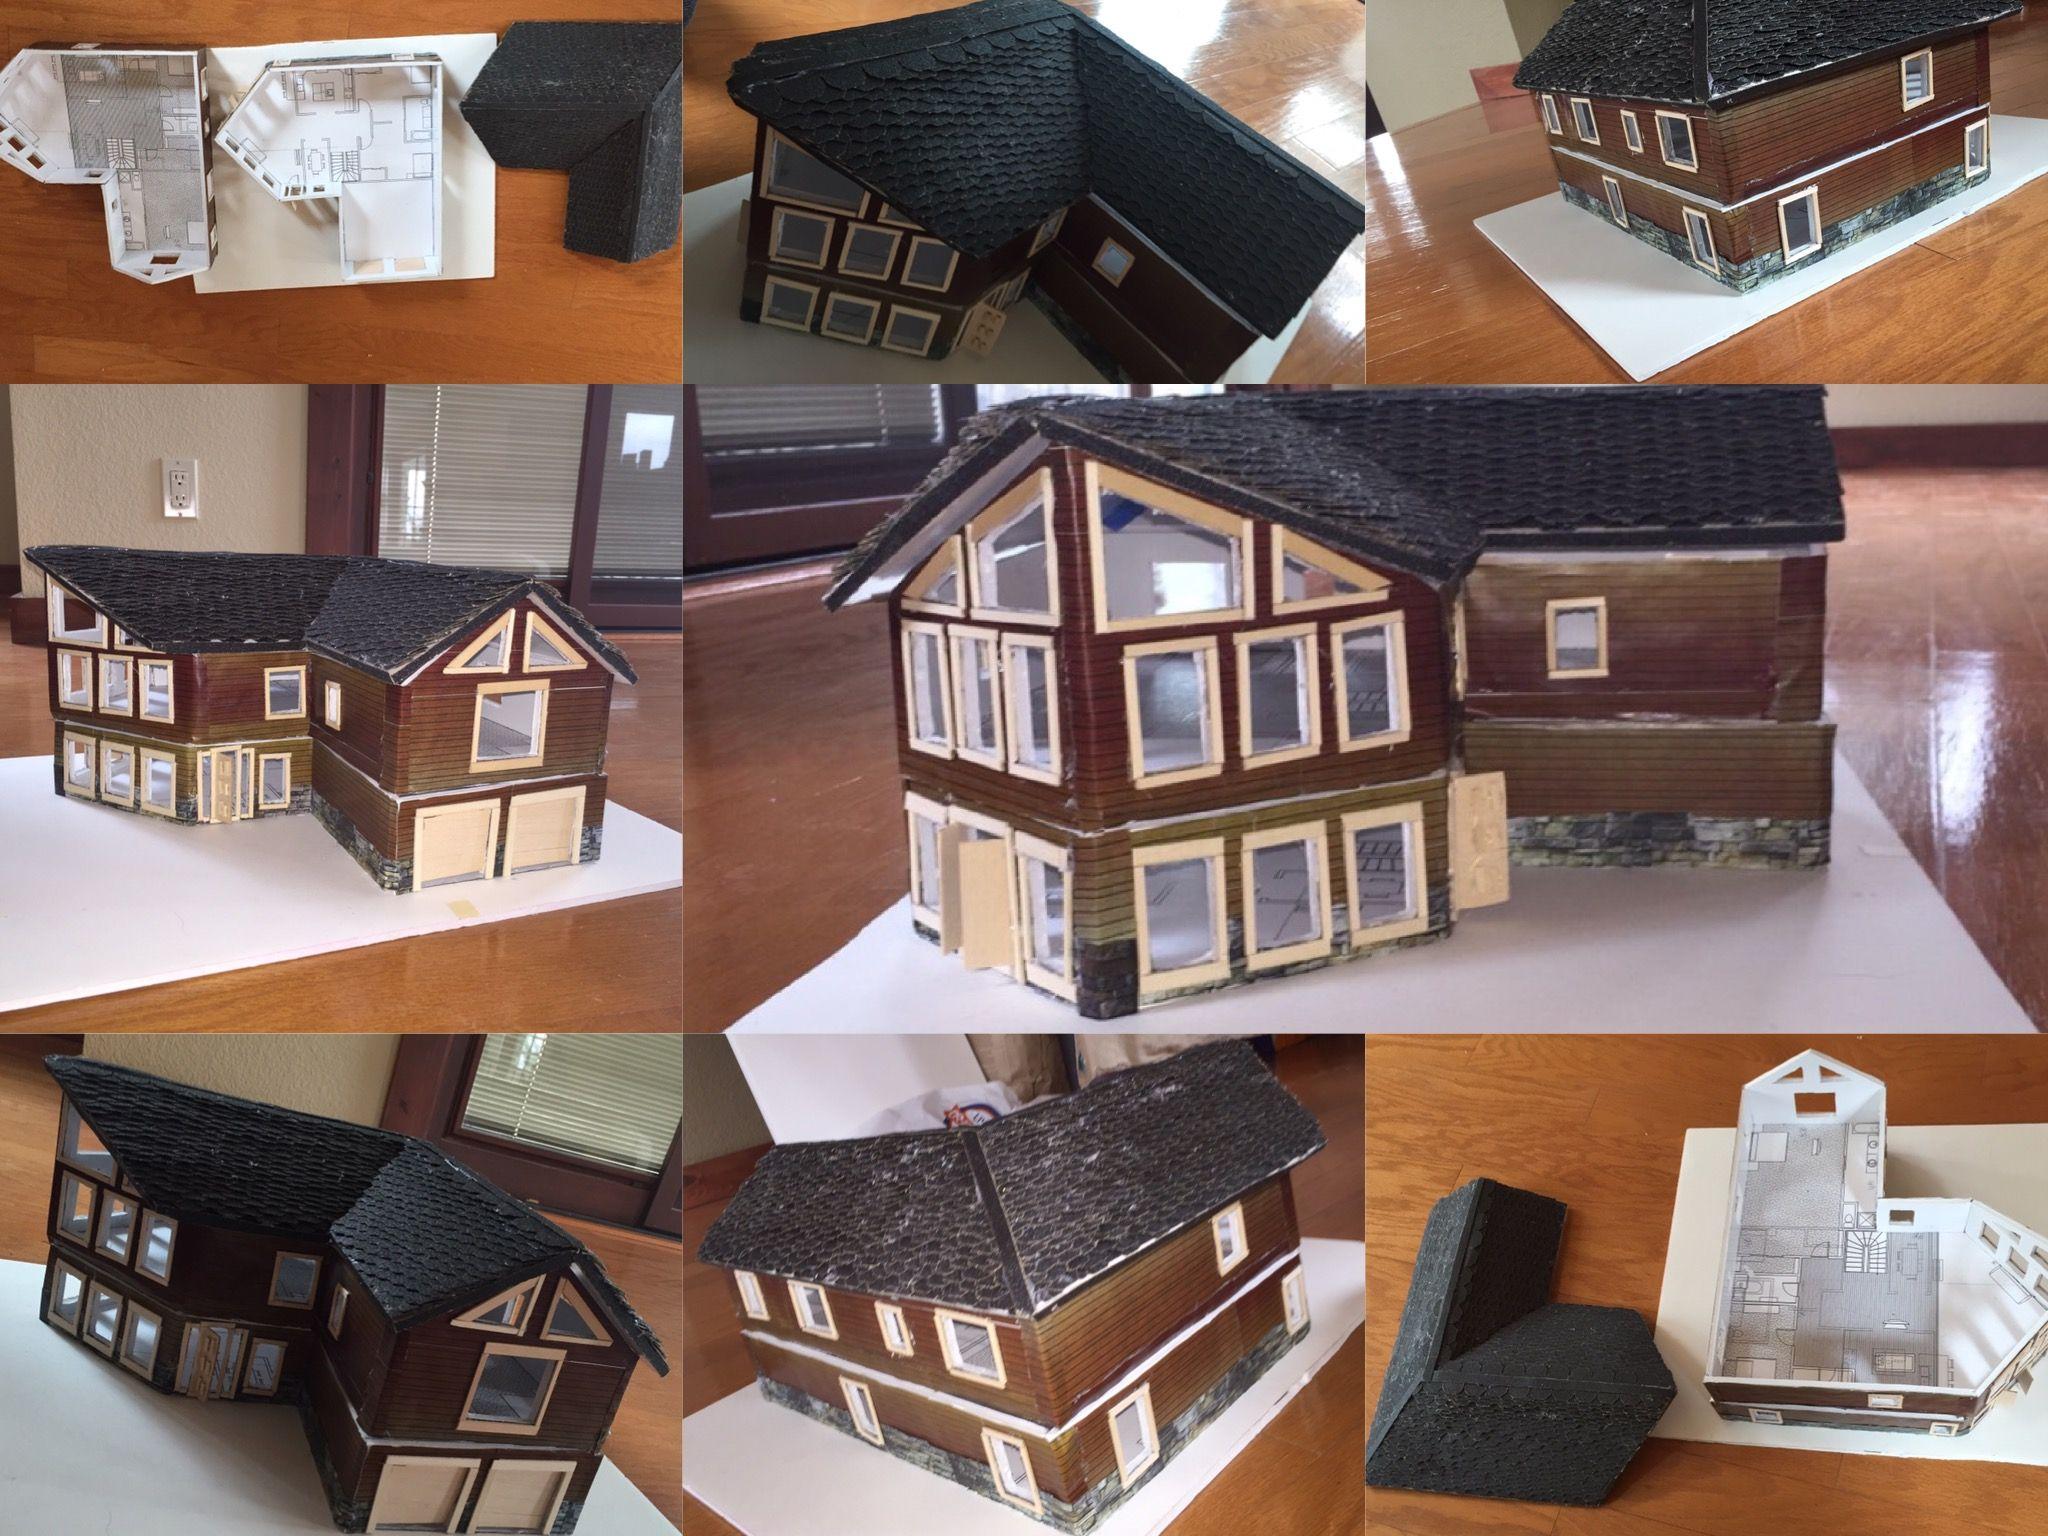 Model house using foam board architecture